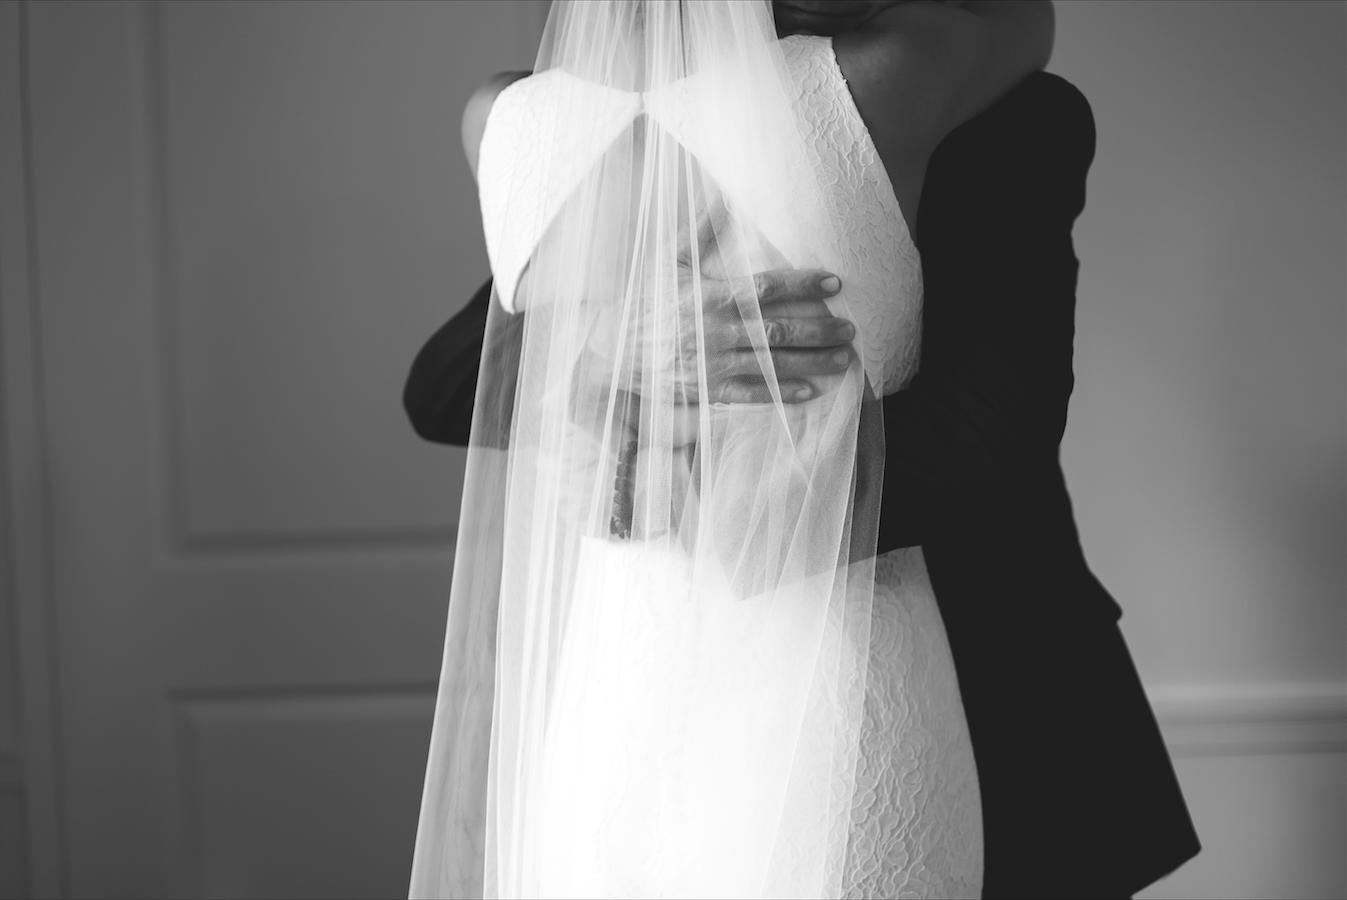 Moments-by-Lauren-Hamilton-Toronto-Niagara-Wedding-Photographer-Genuine-Emotional-Images-Photo-1.png